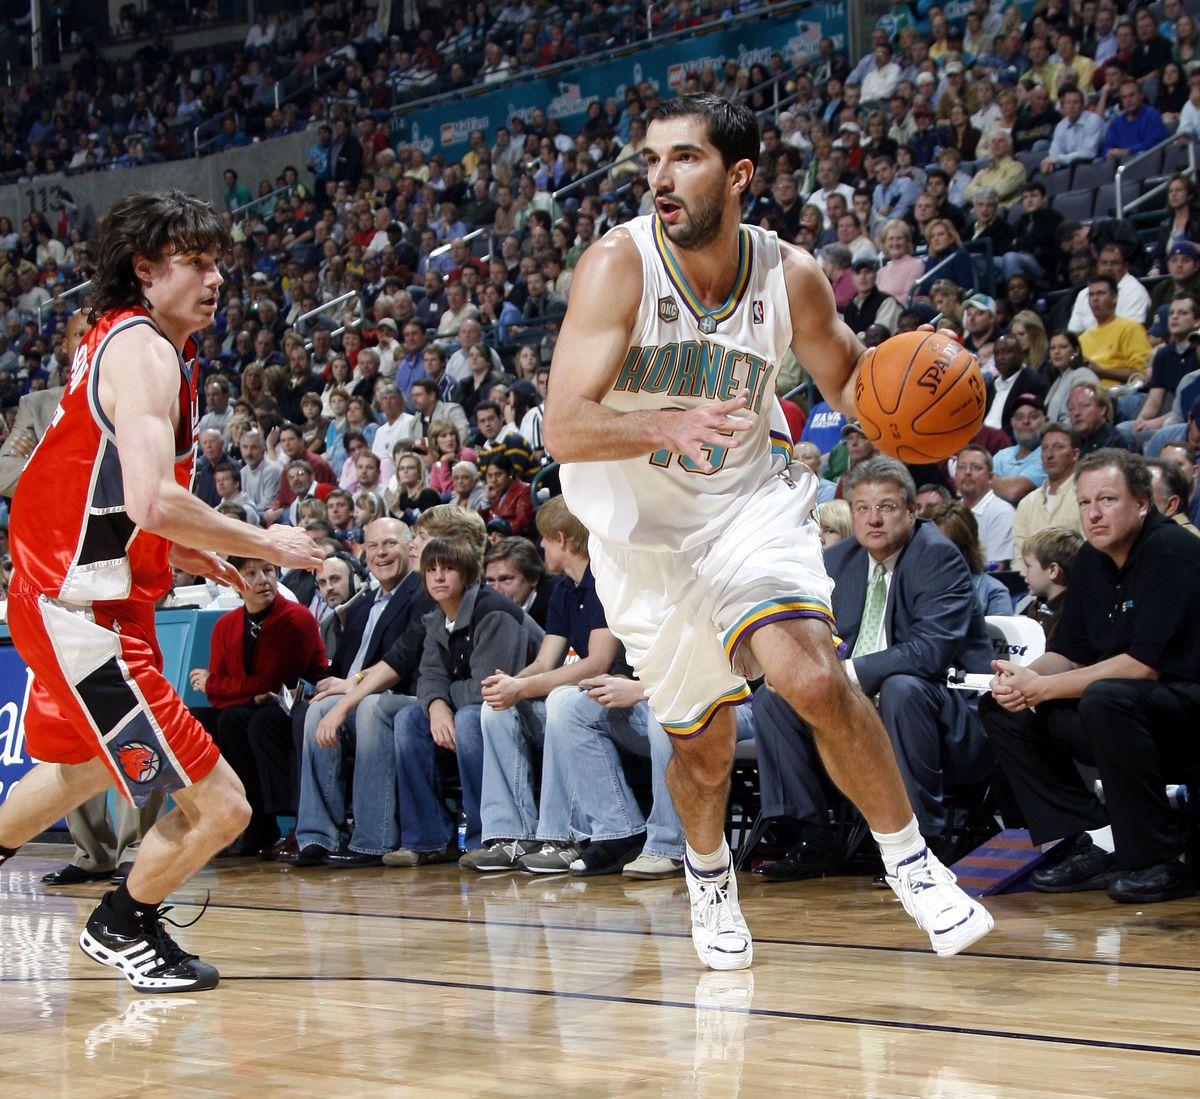 Charlotte Bobcats v New Orleans/Oklahoma City Hornets